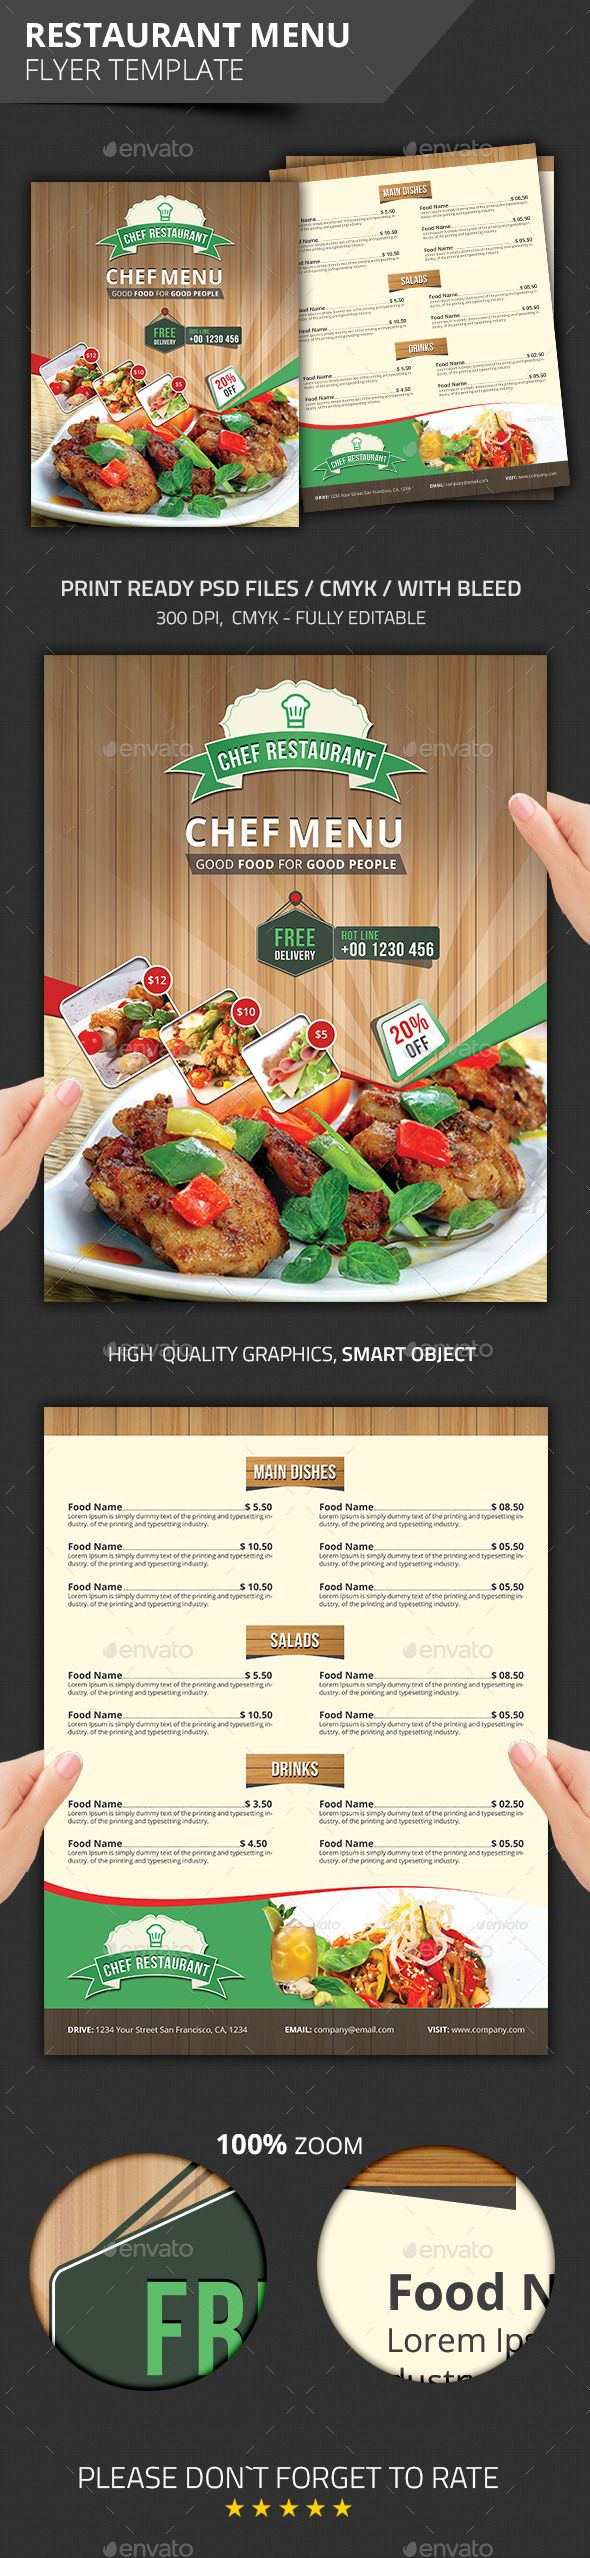 pin by designshub on best flyer templates pinterest menu